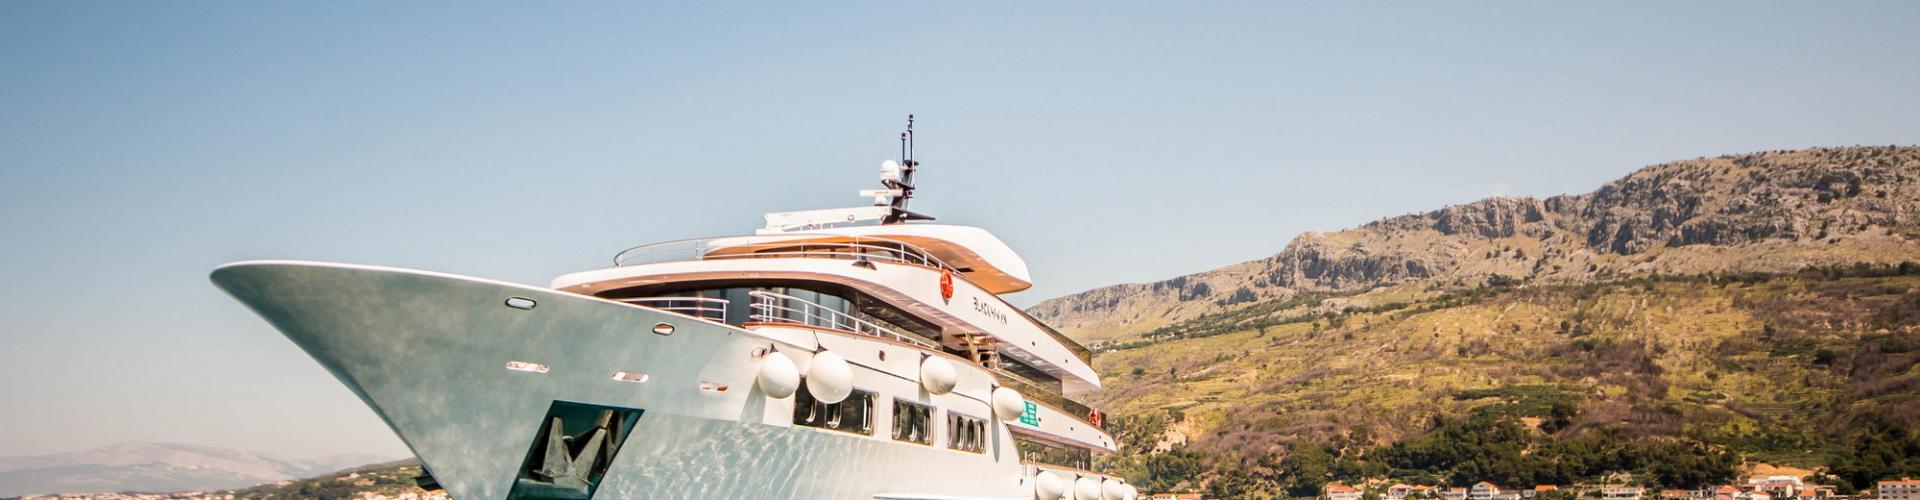 2018. Deluxe Superior cruiser MV Black Swan